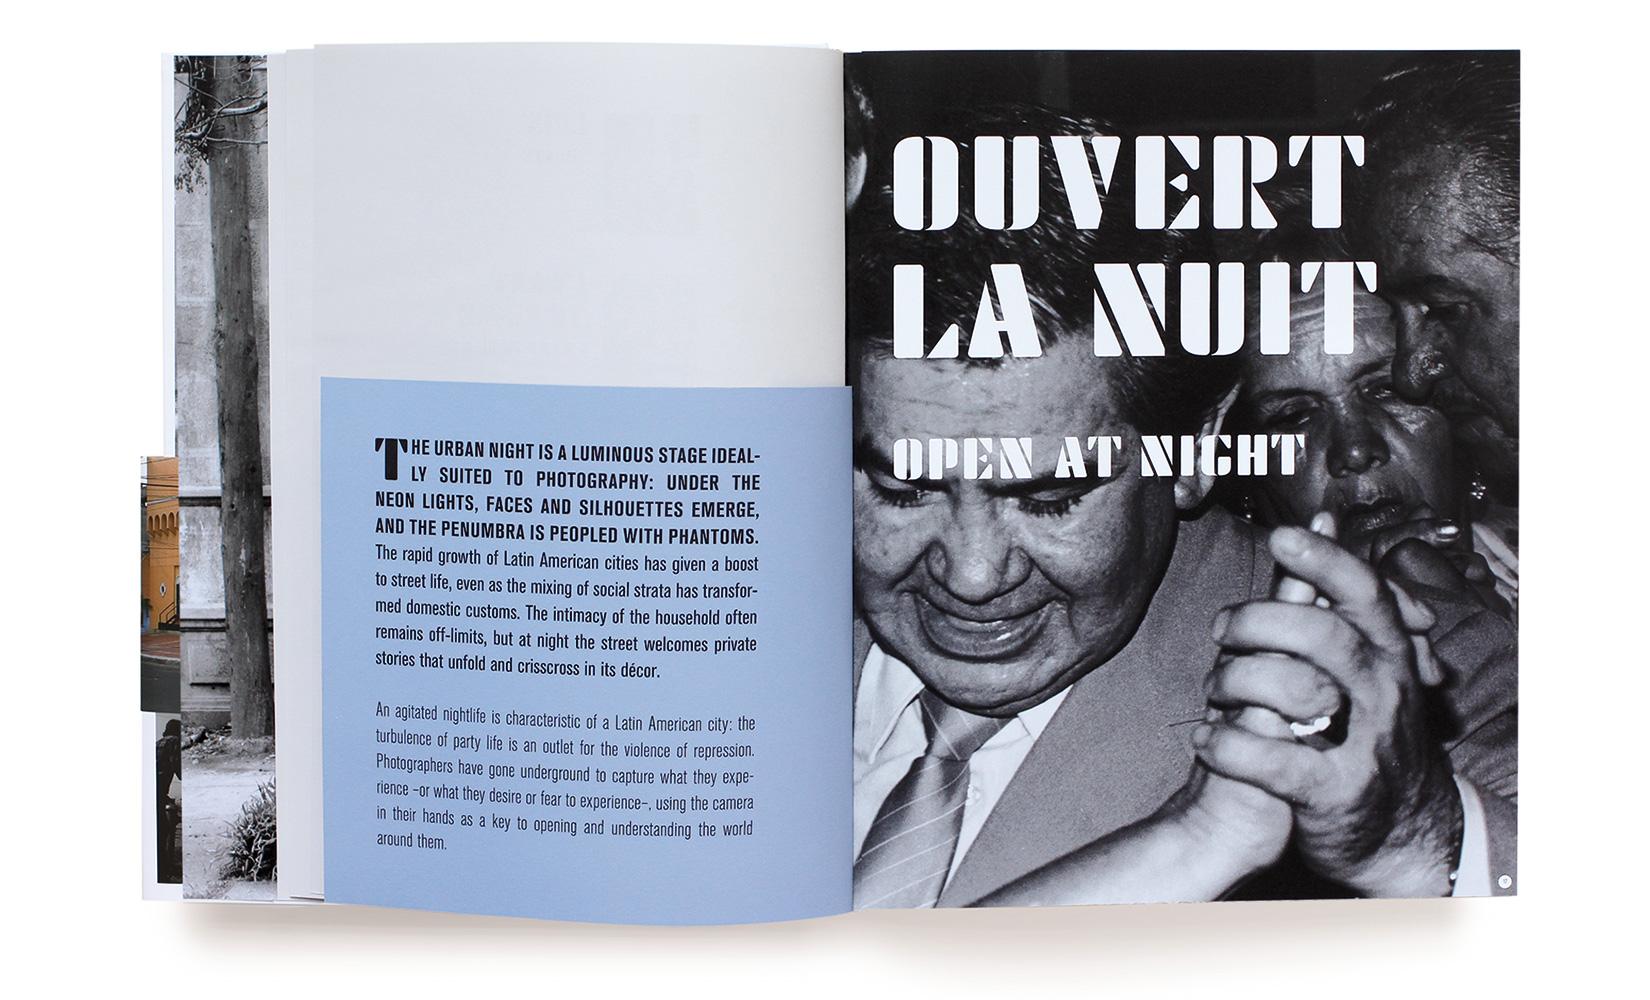 olivier-andreotti-pulsions-urbaines-07.jpg